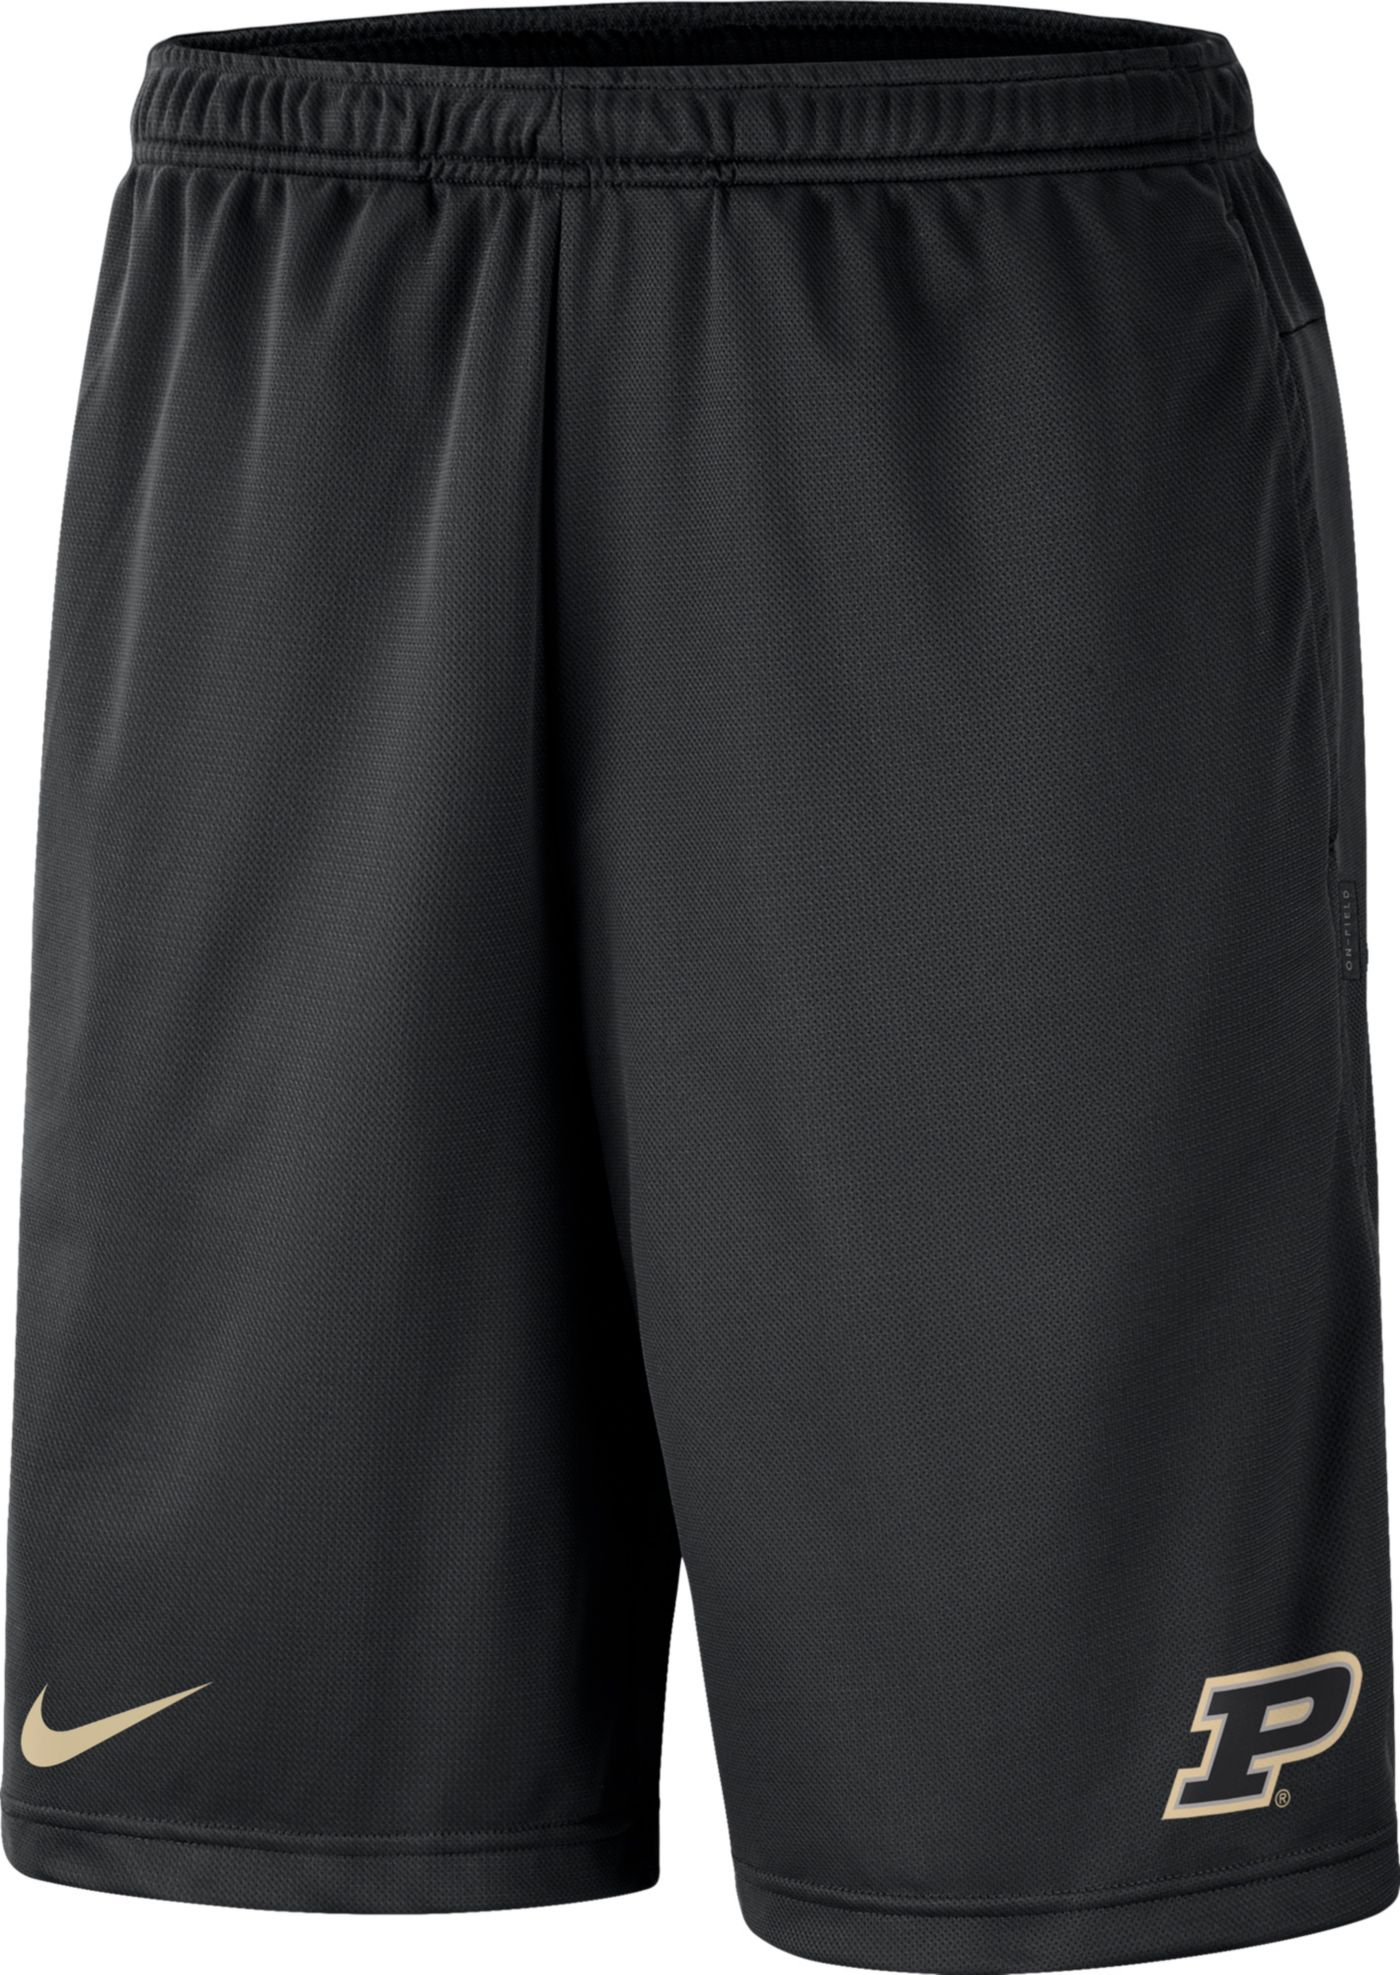 Nike Men's Purdue Boilermakers Dri-FIT Coach Black Shorts